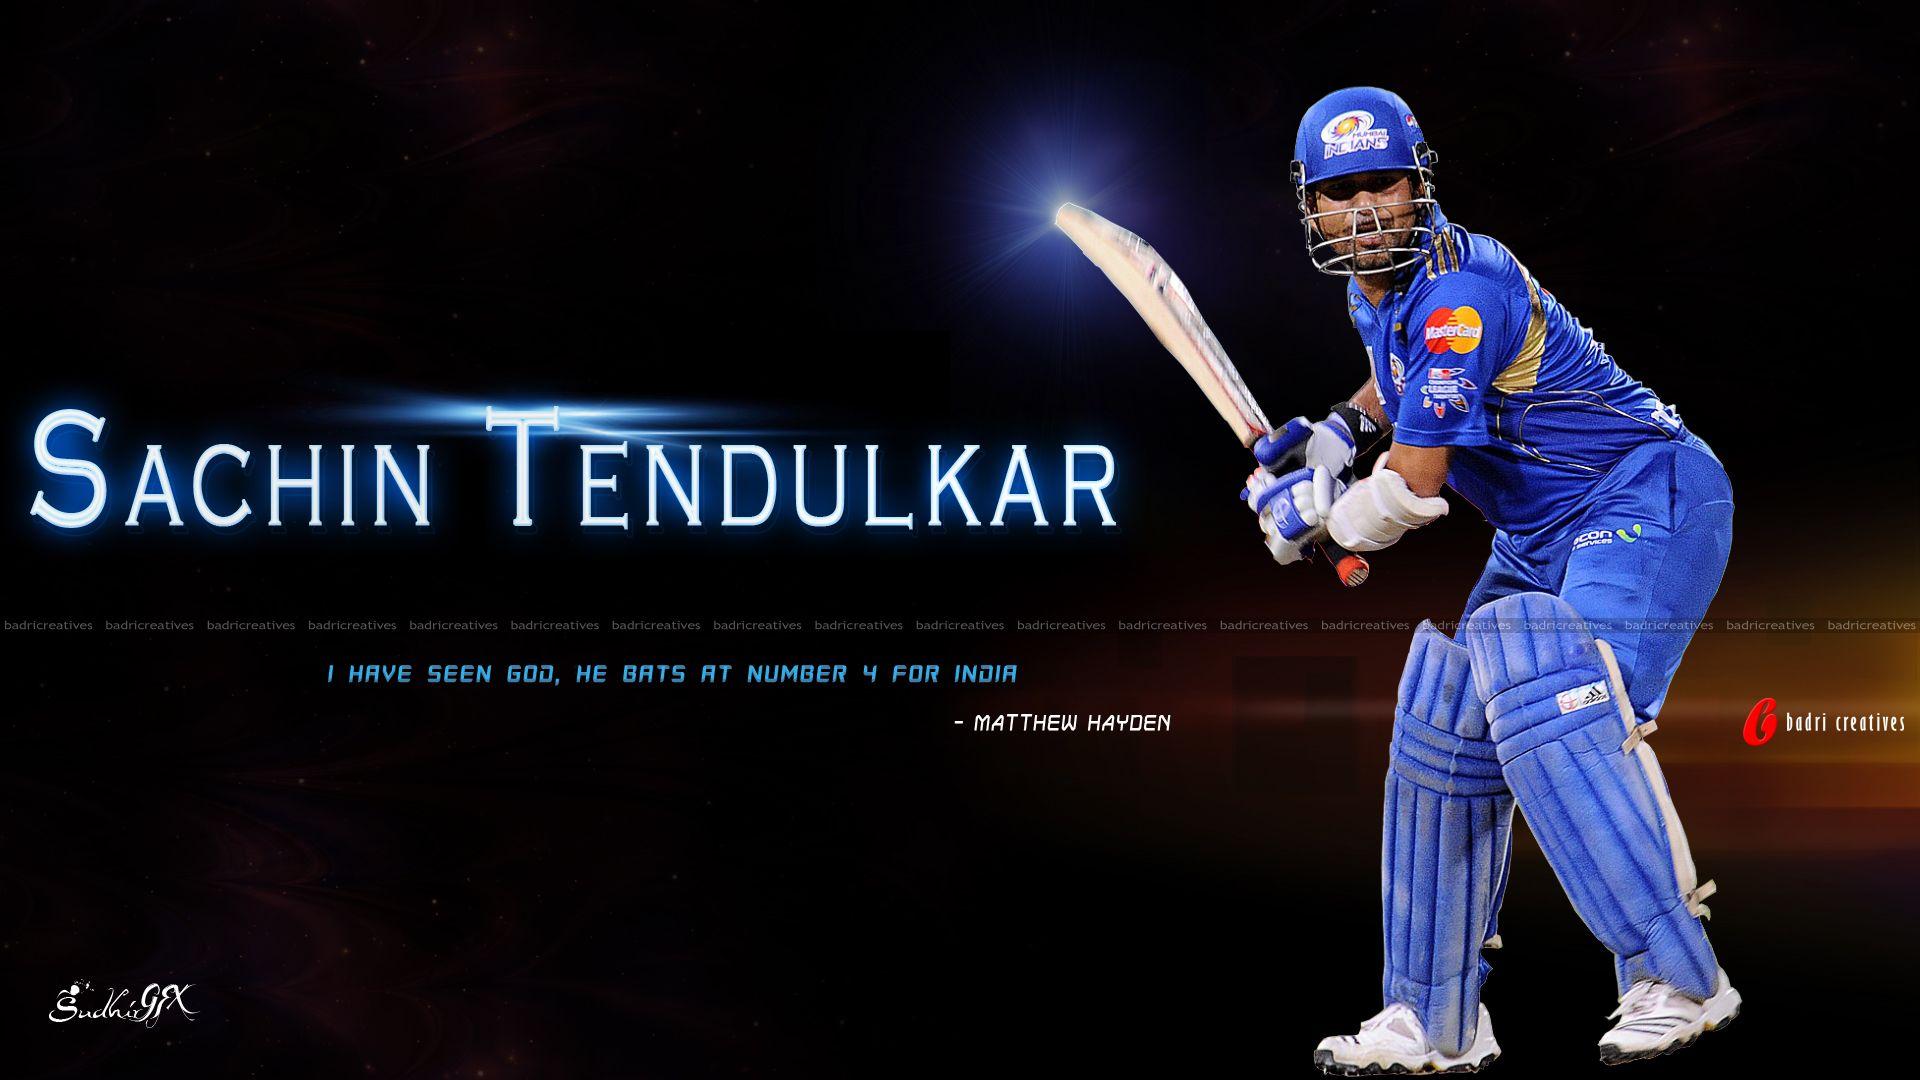 Sachin Tendulkar Hd Wallpaper Sports Hq Wallpapers Sachin